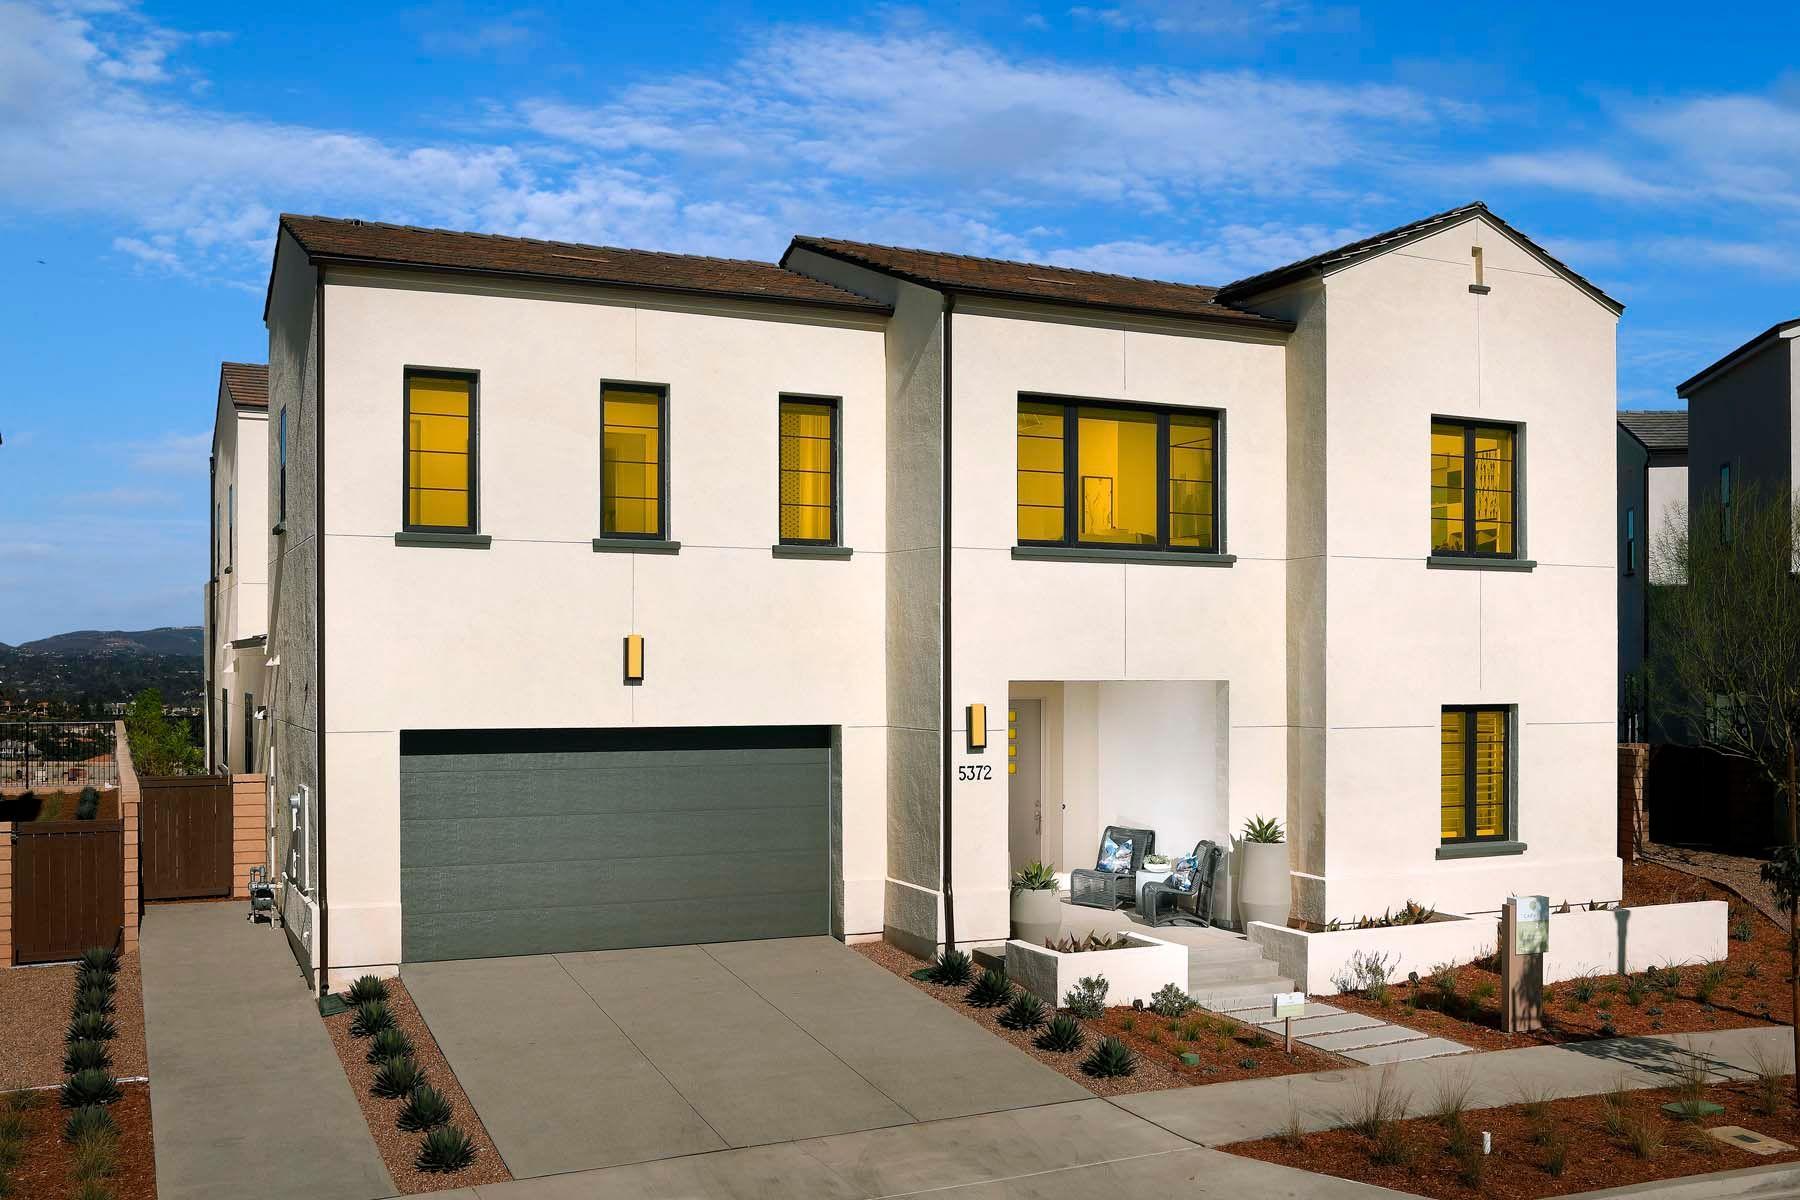 PDH-residence-PRD-Carmel2a-ExtR:Carmel - Plan 2 - Front Exterior